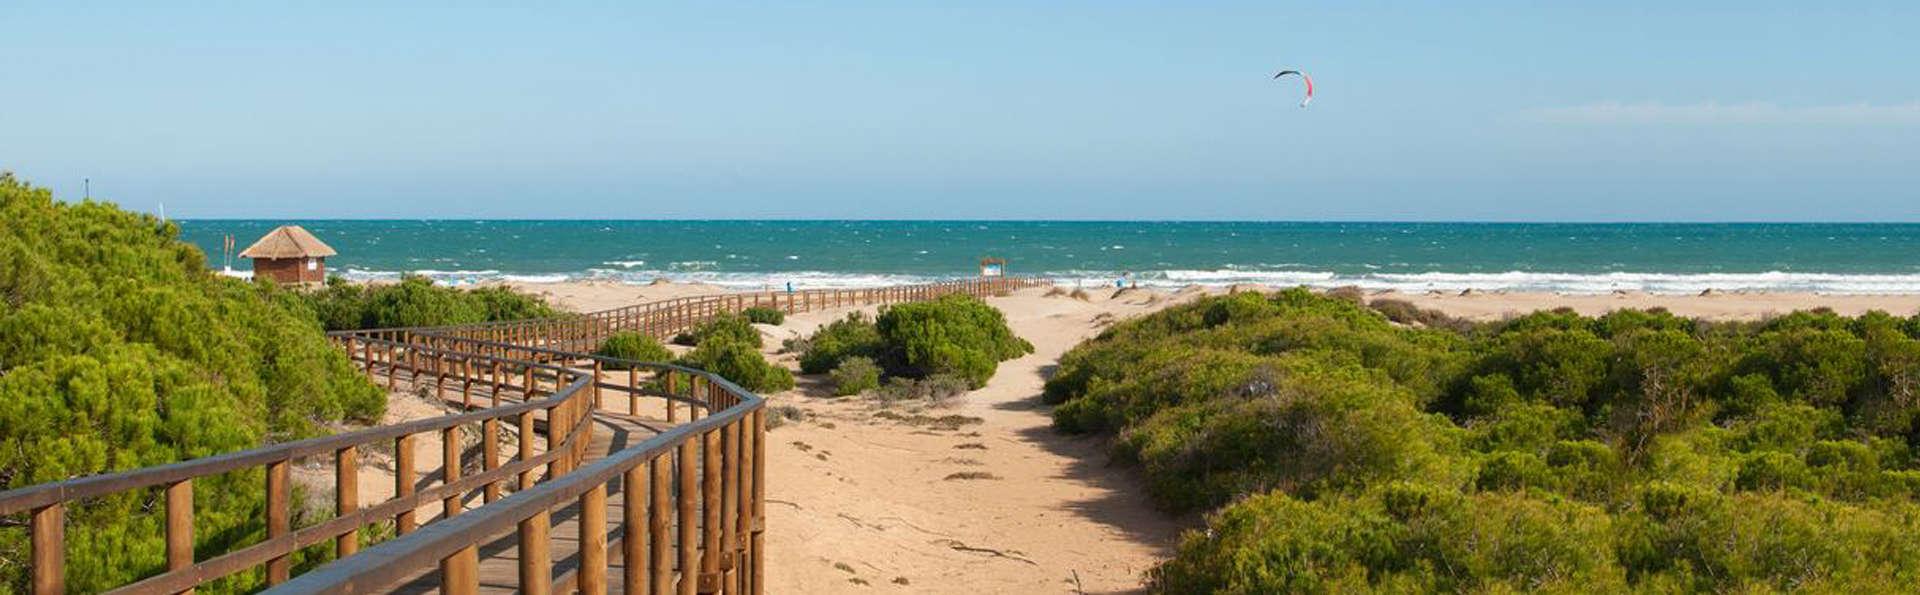 Hotel Areca  - edit_beach.jpg